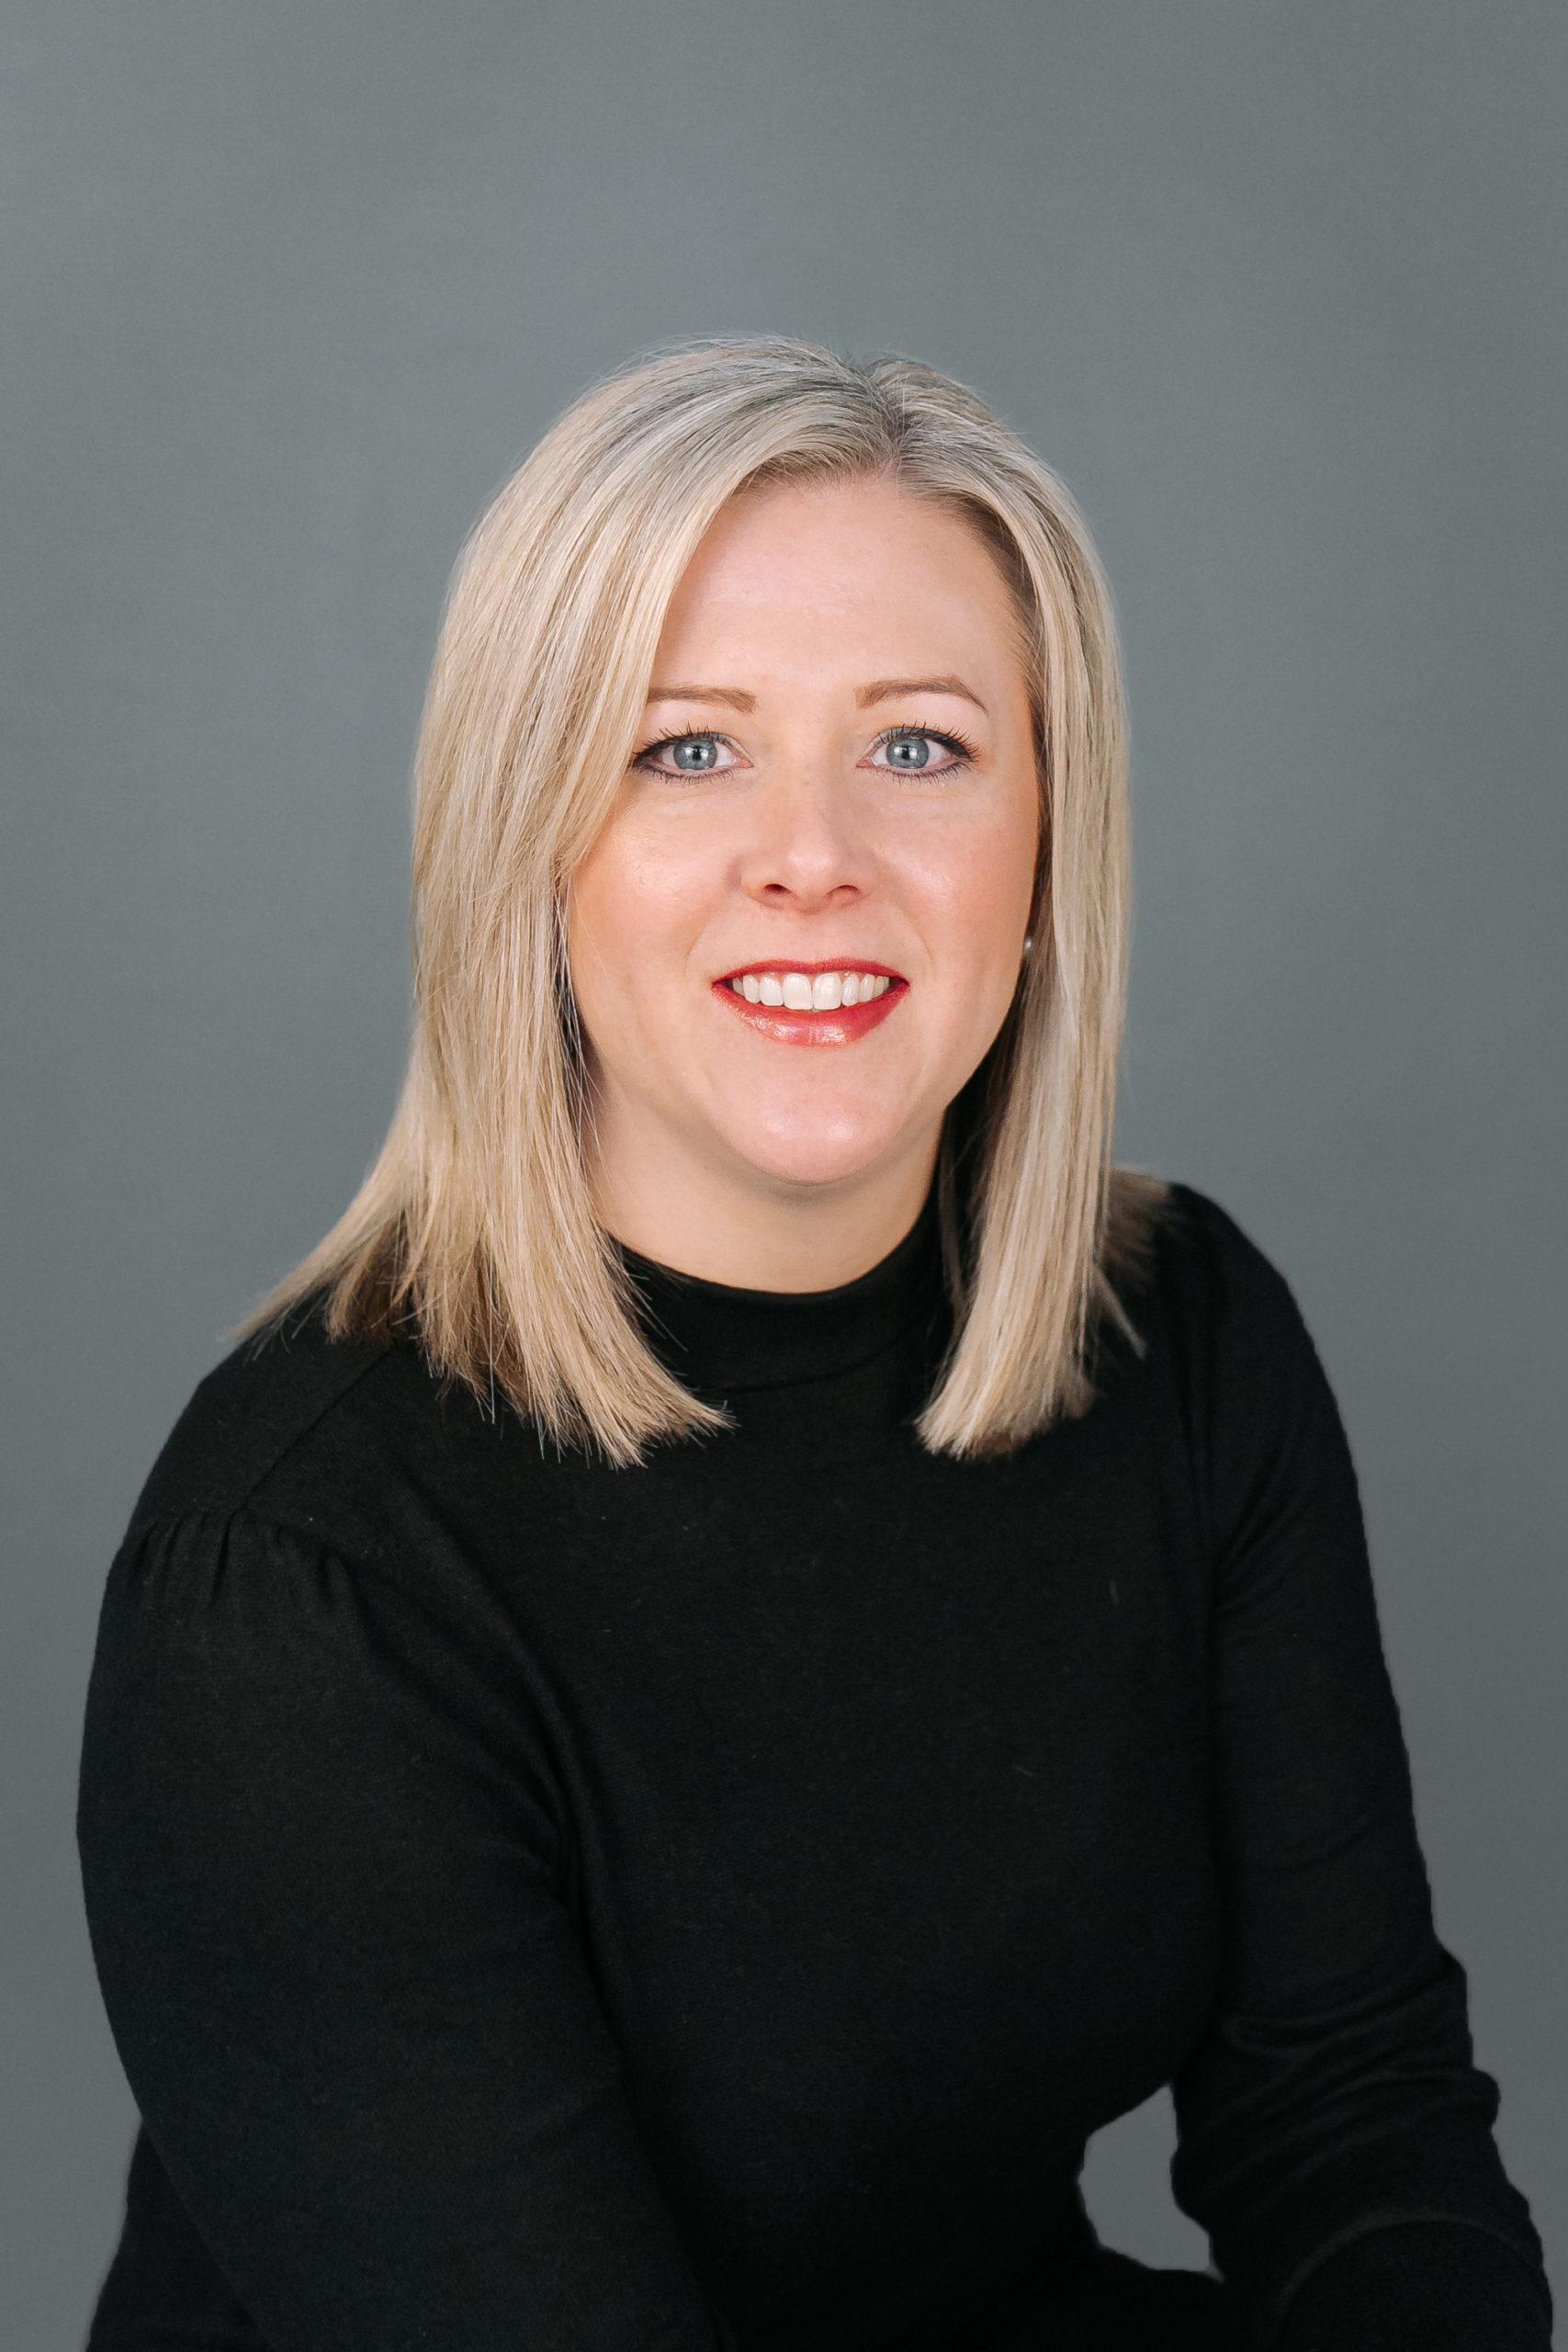 Image of Lonneka Nagle